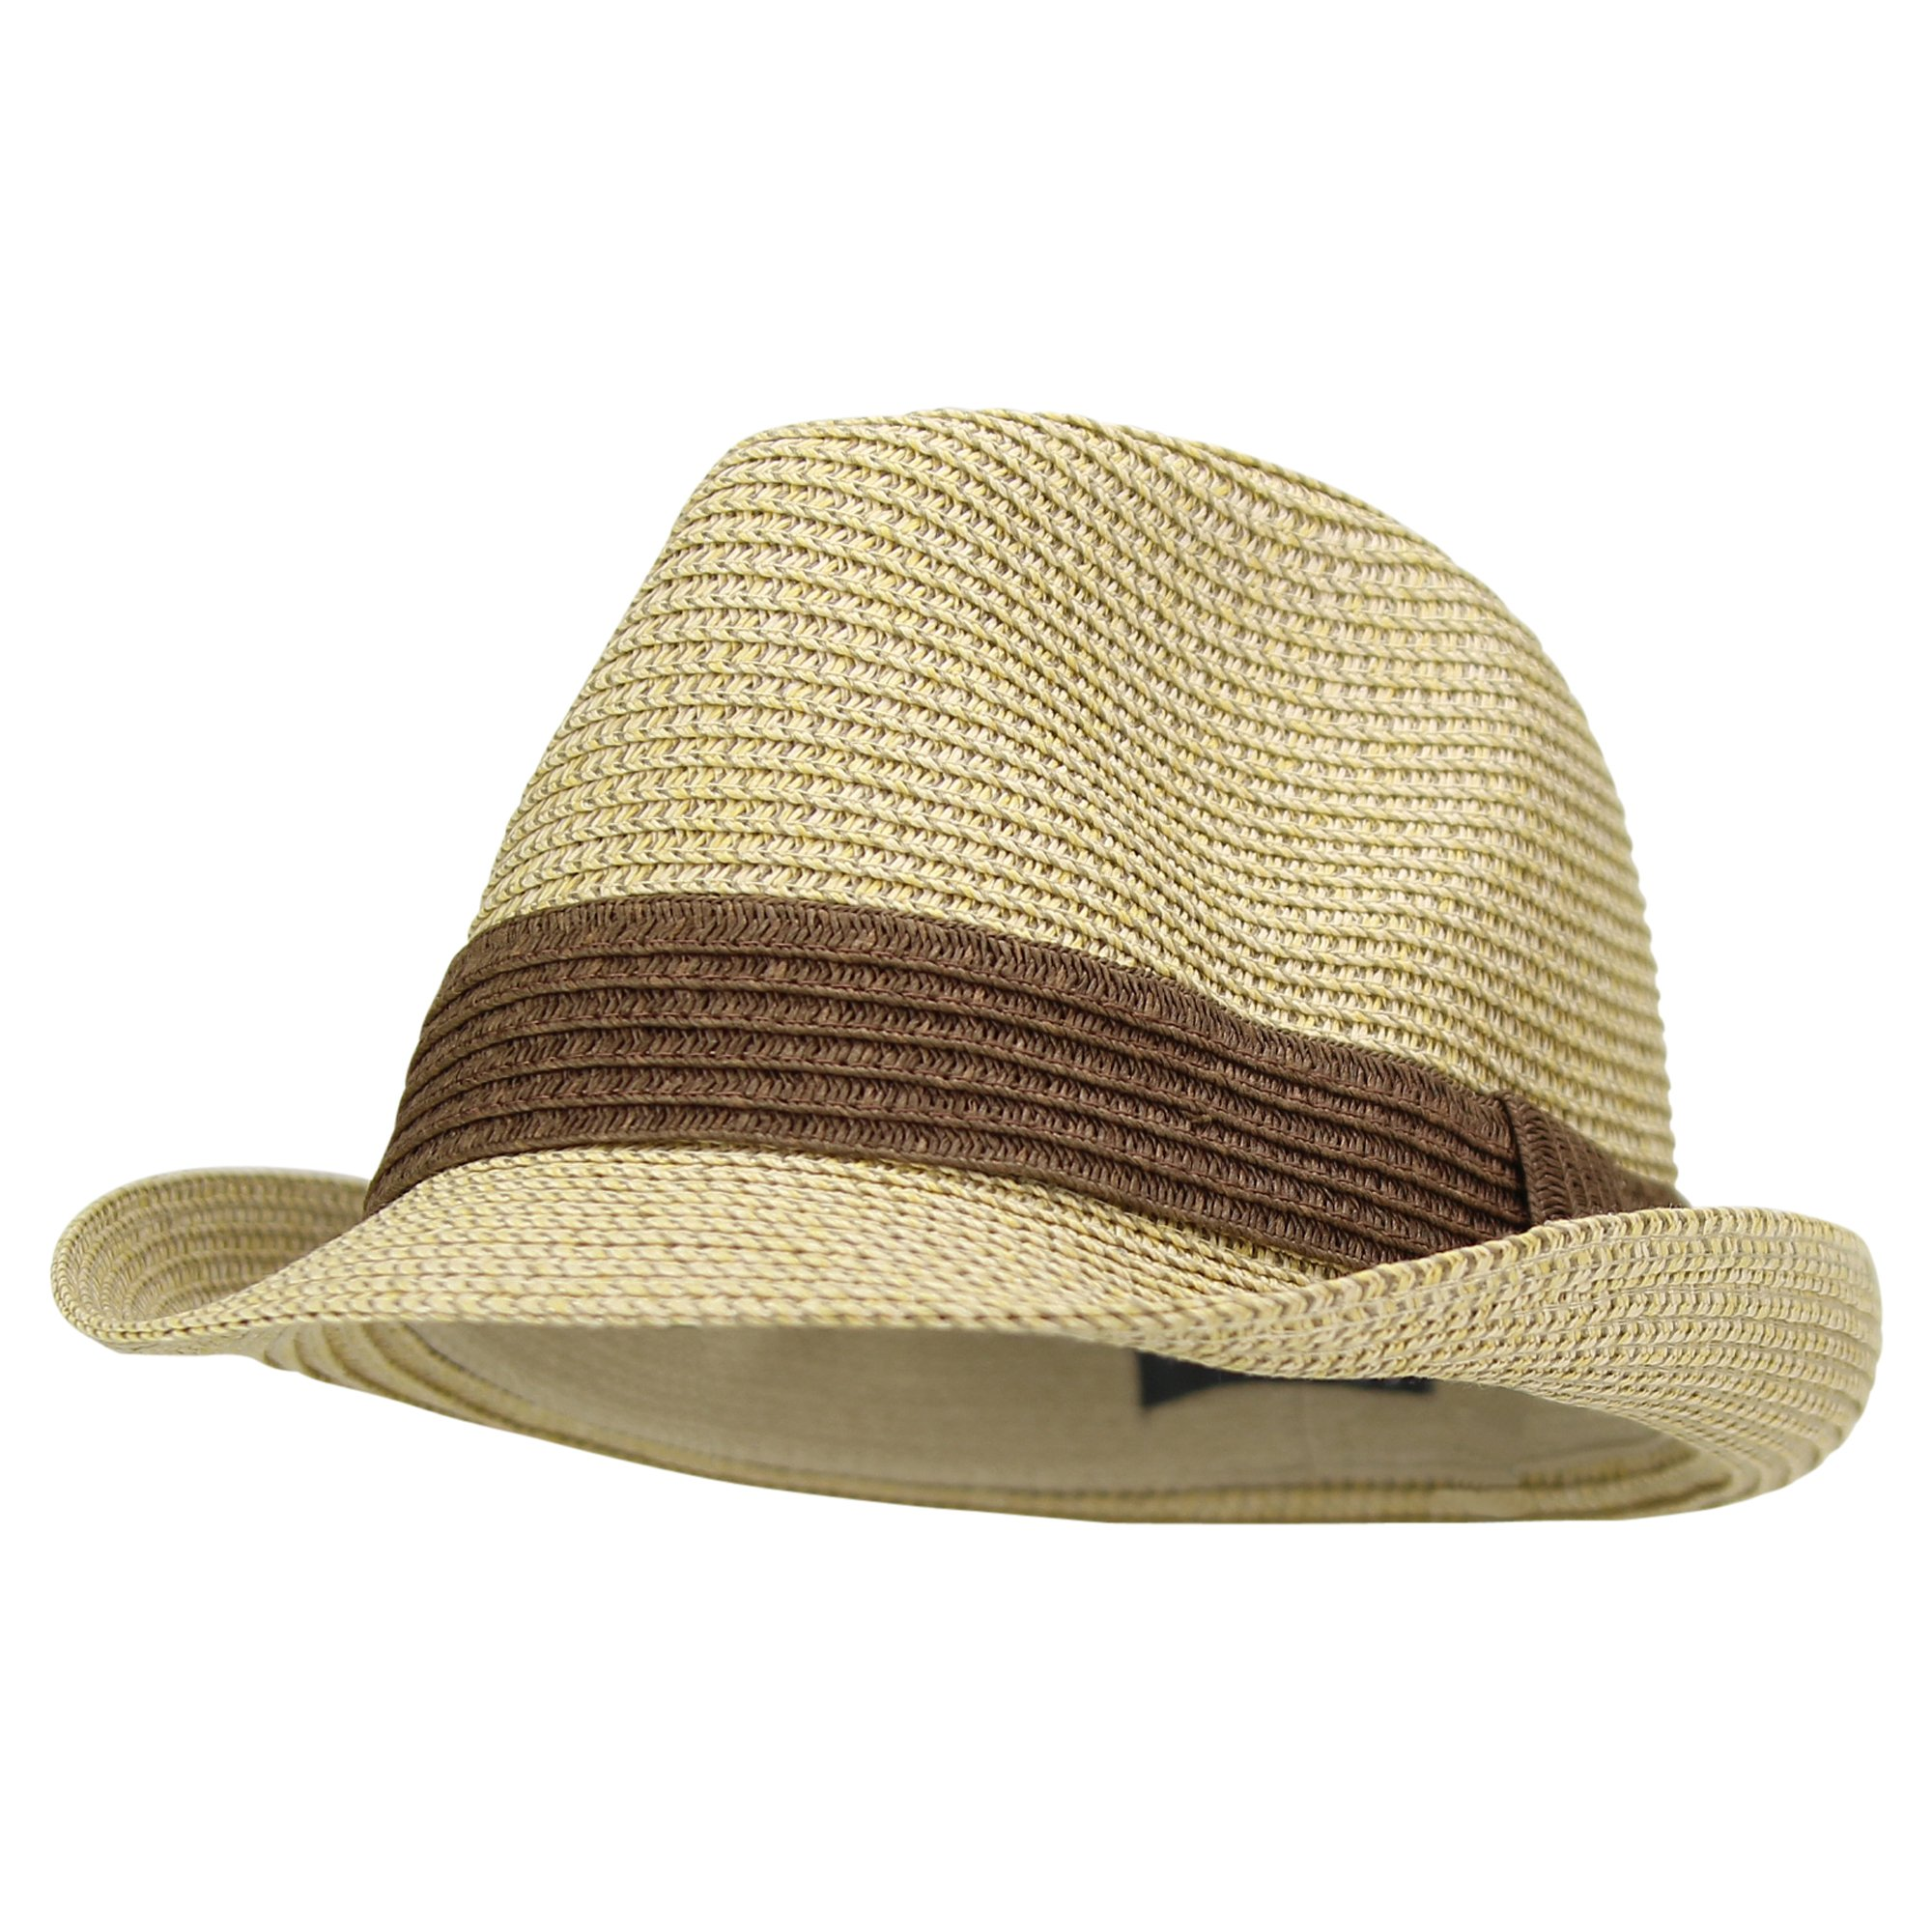 Urban Boundaries Women's Stretch Fit Paper Straw Fedora Hat (Brown)